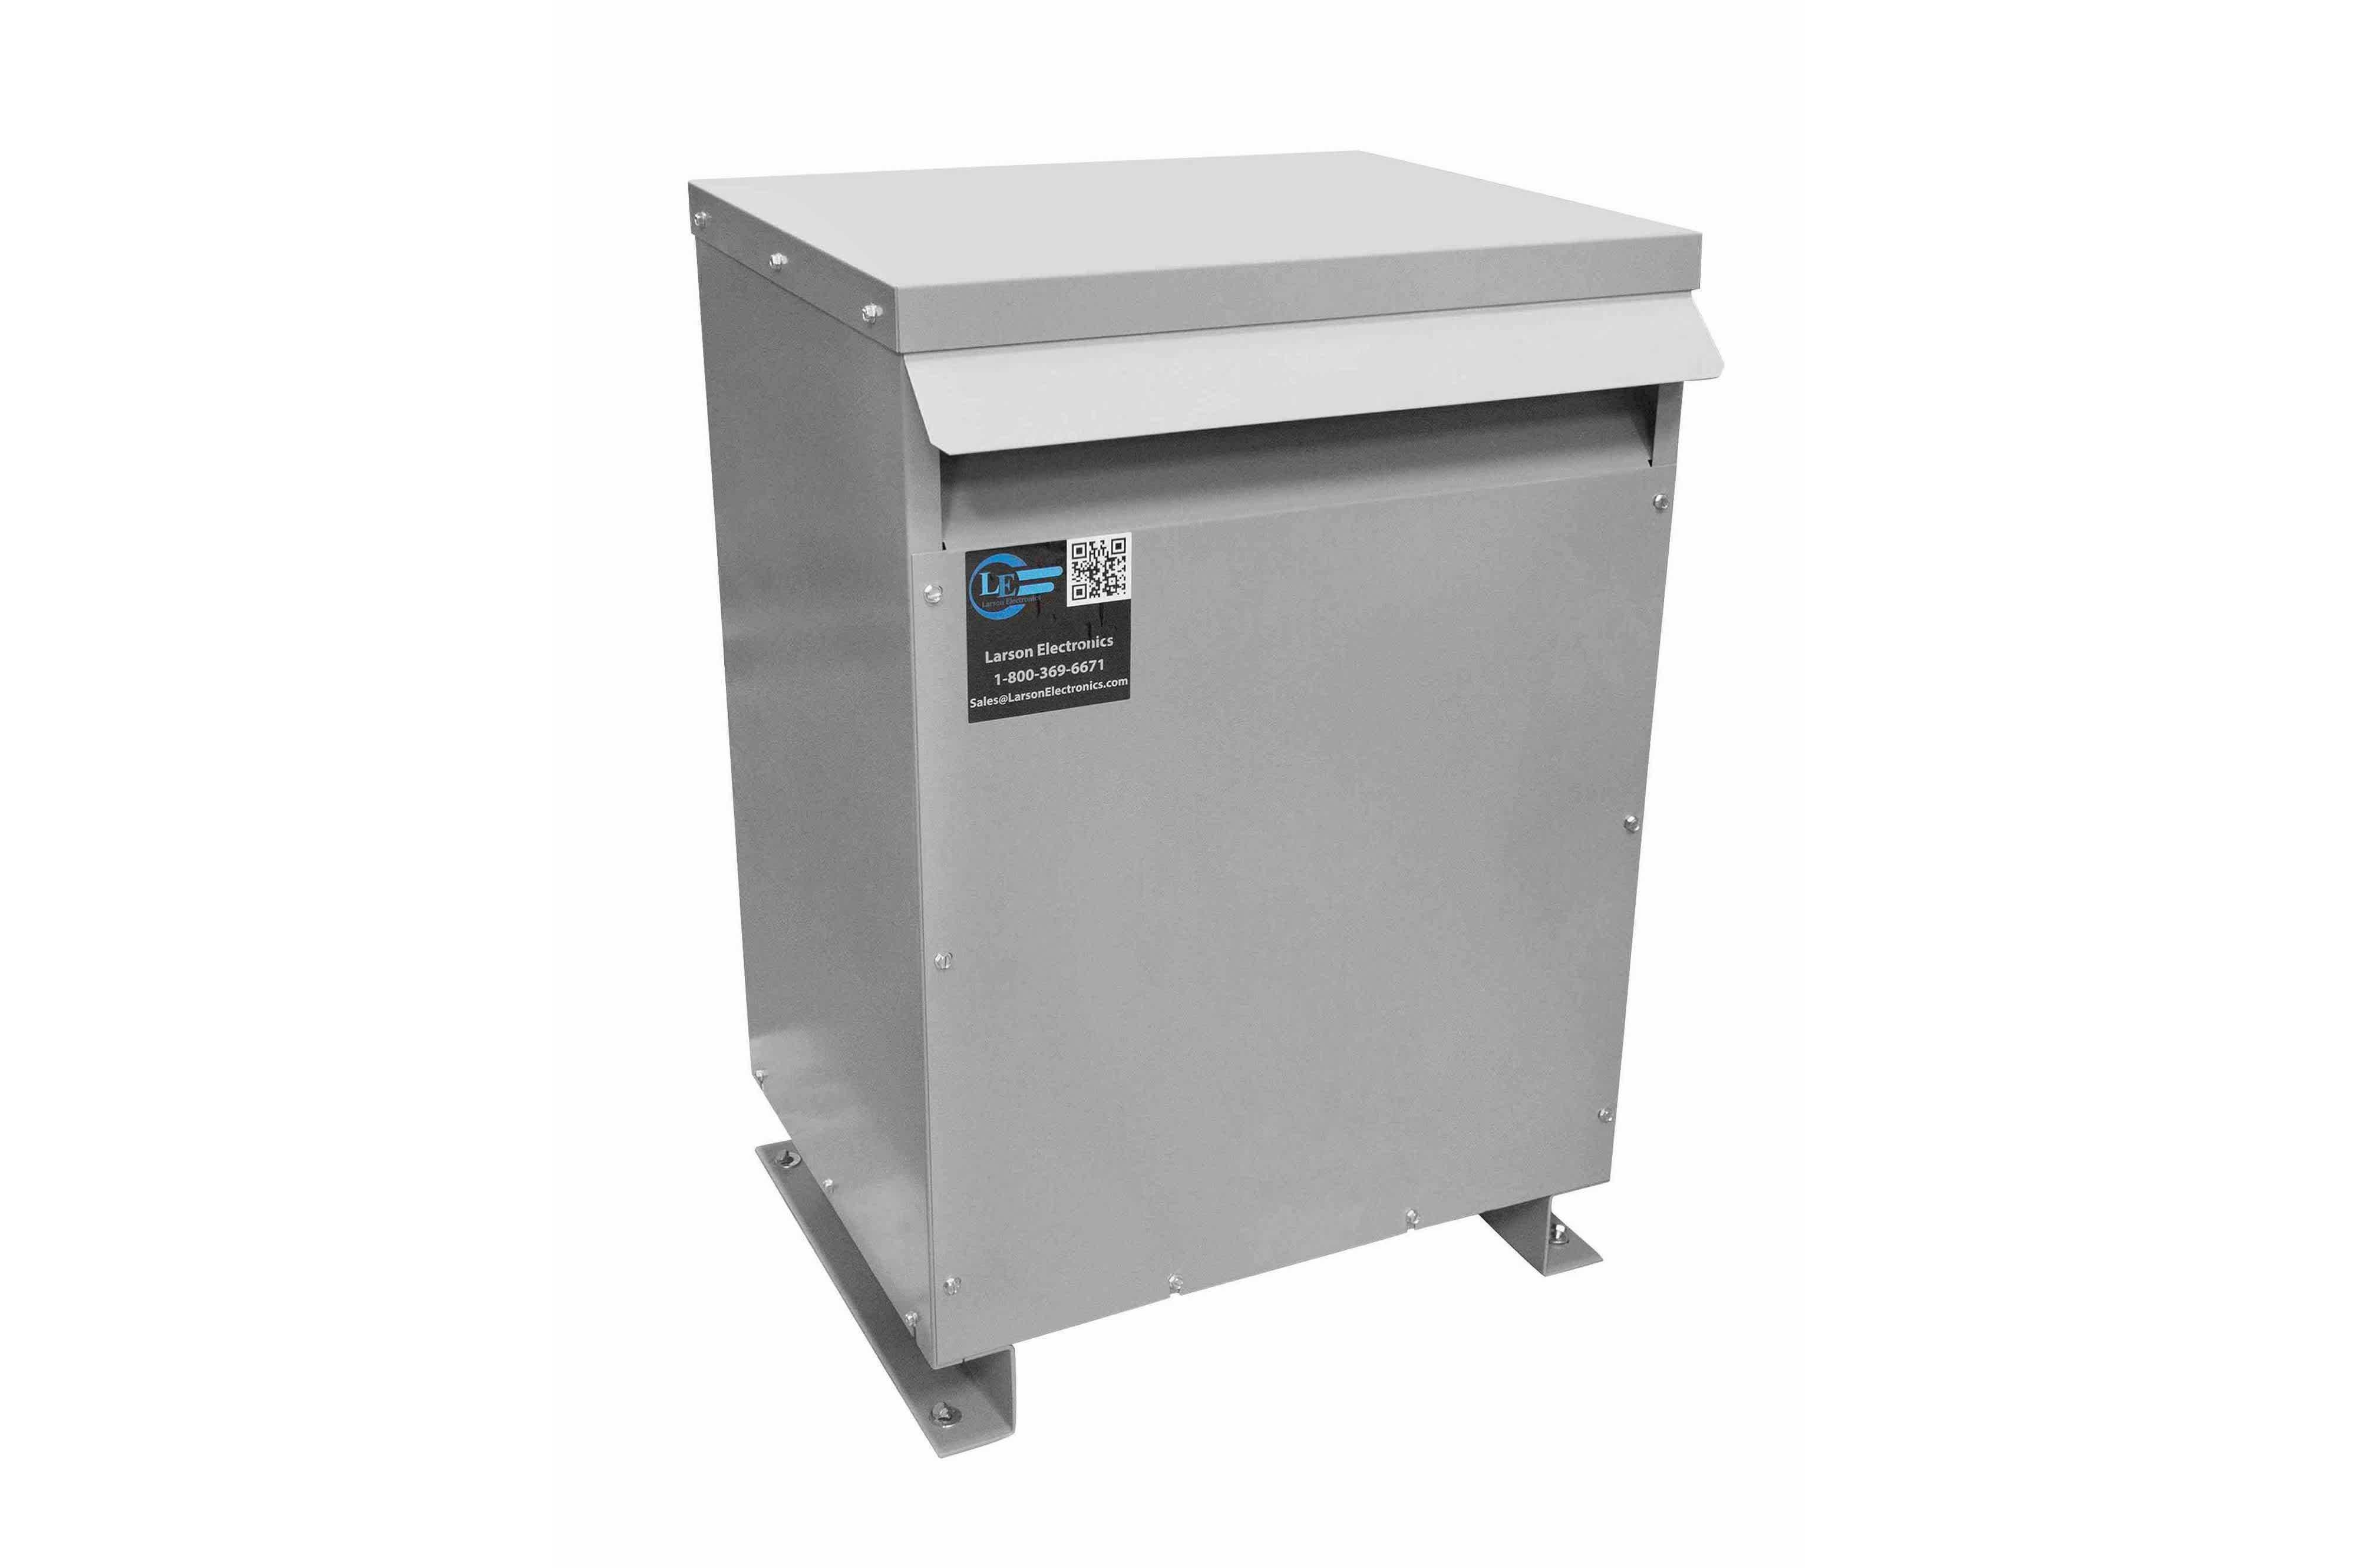 750 kVA 3PH Isolation Transformer, 400V Wye Primary, 240V/120 Delta Secondary, N3R, Ventilated, 60 Hz